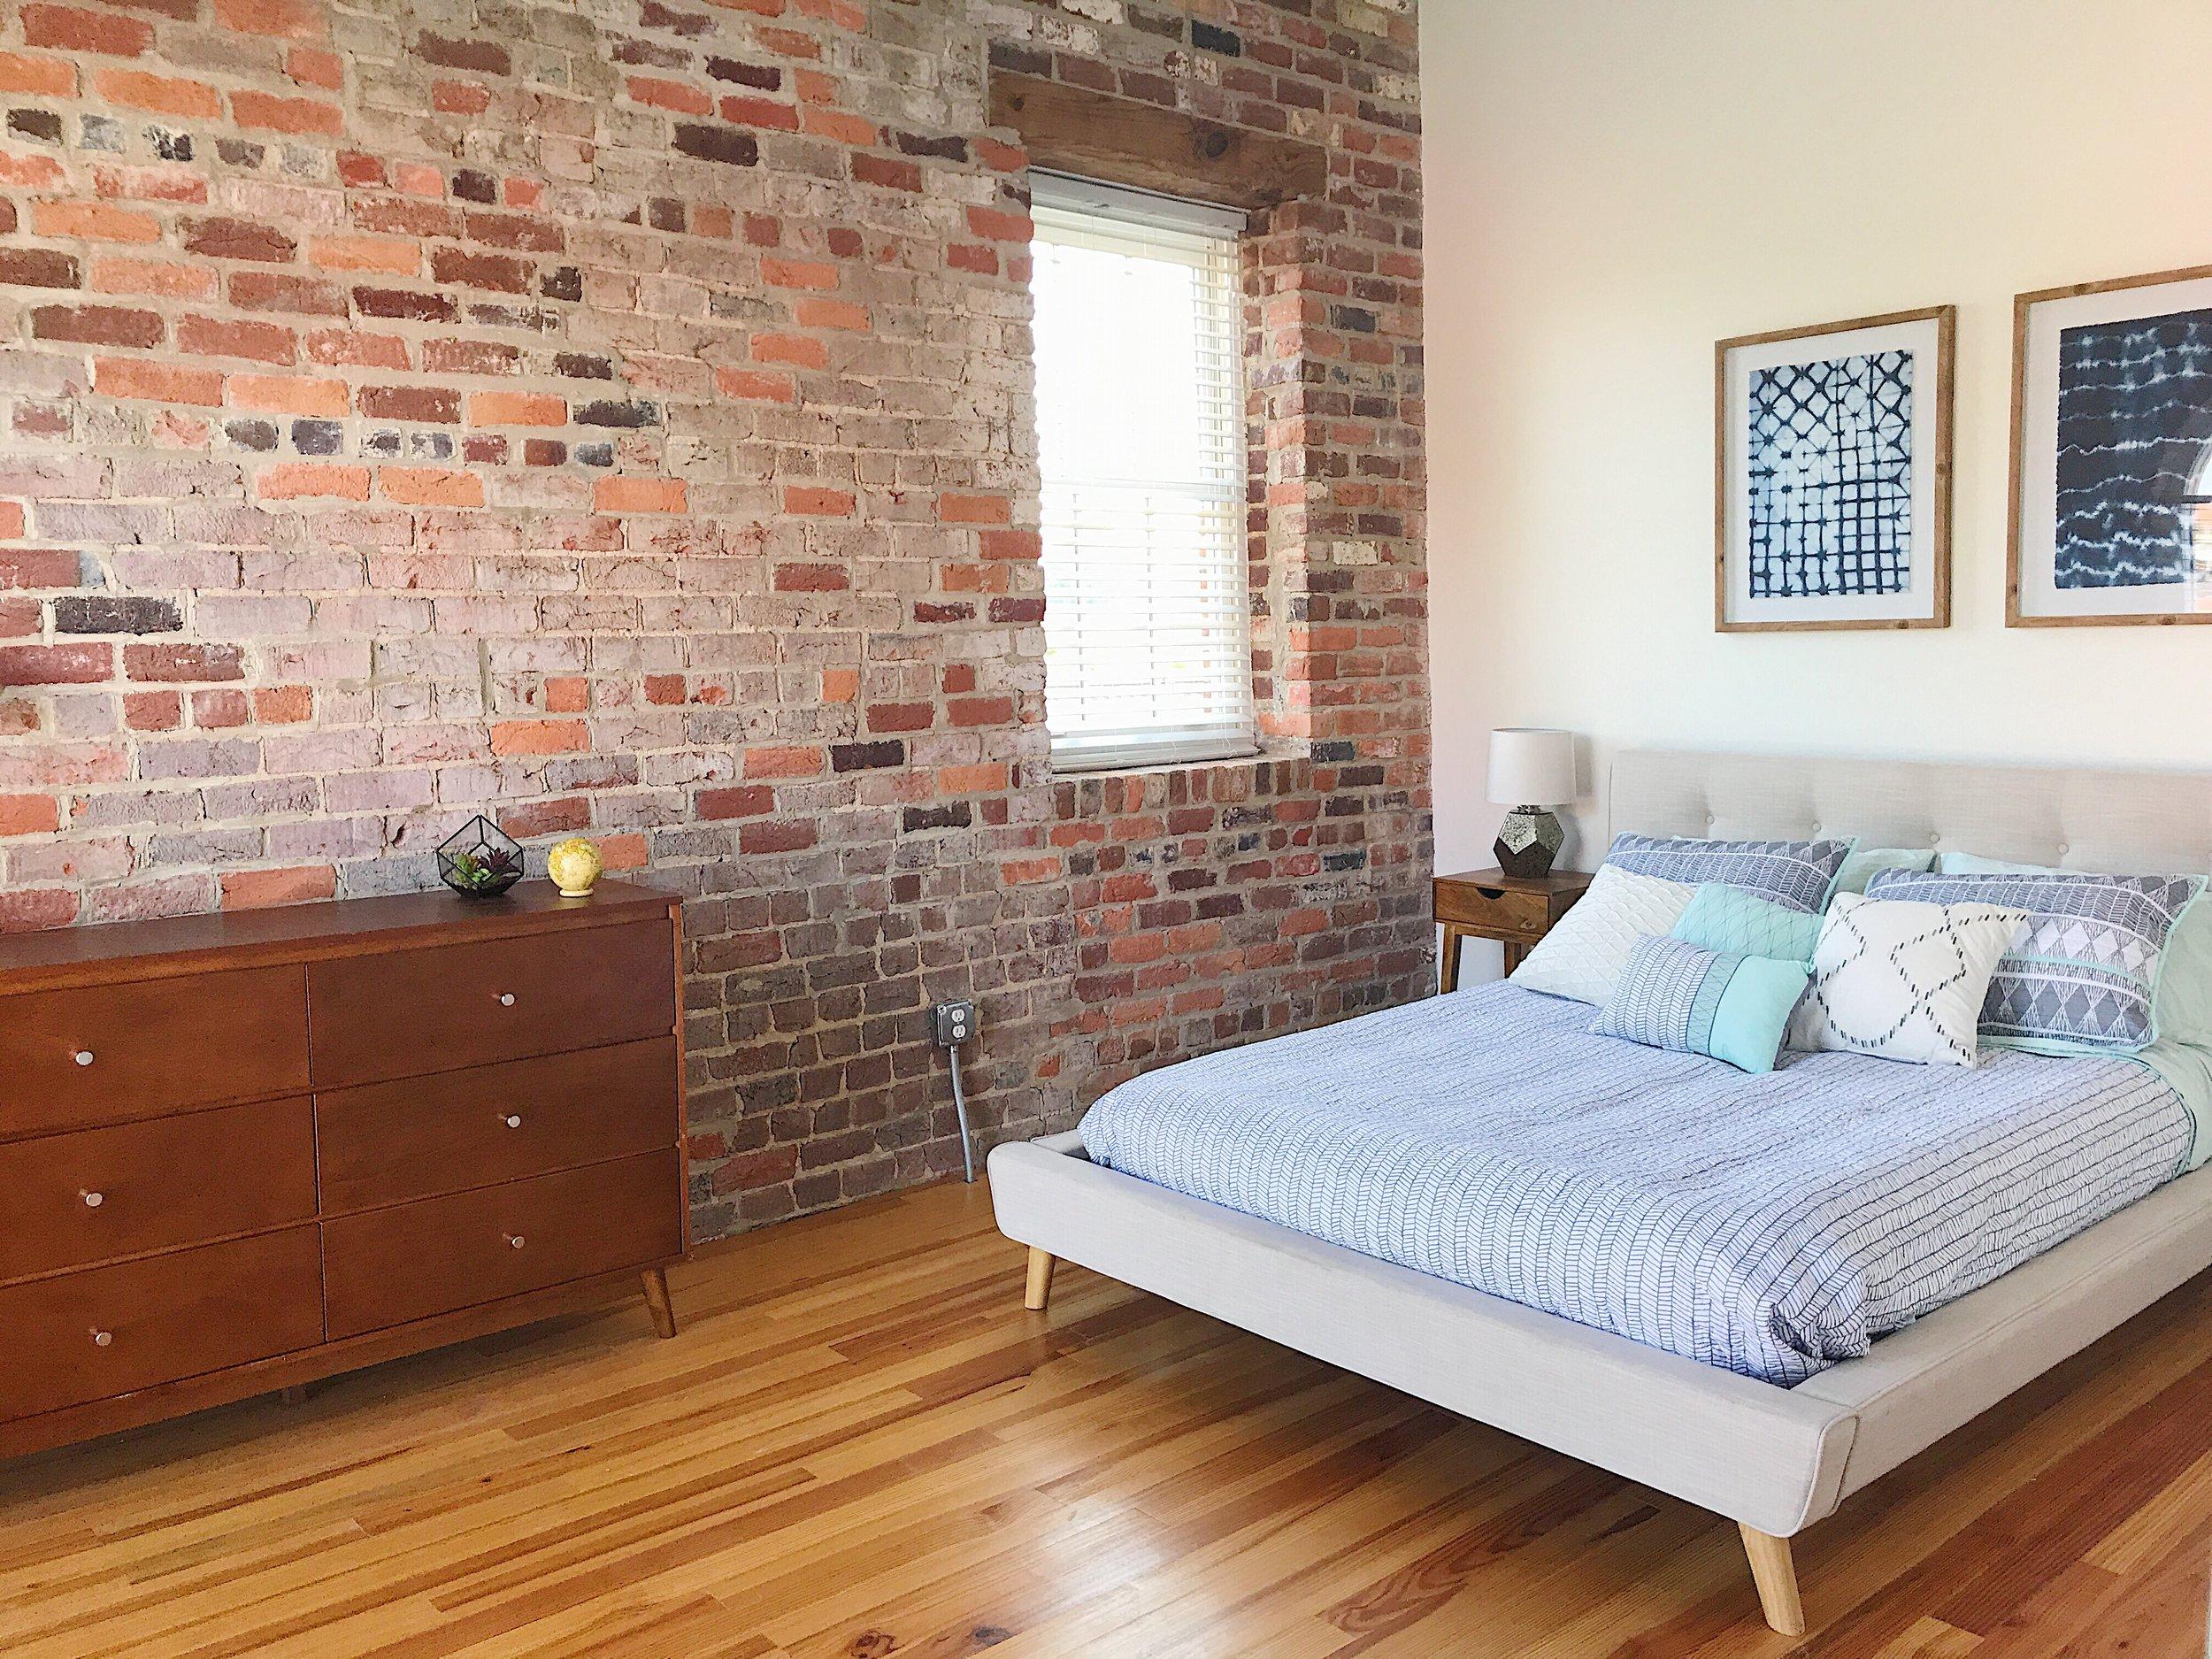 TPZM bedroom 2.jpg